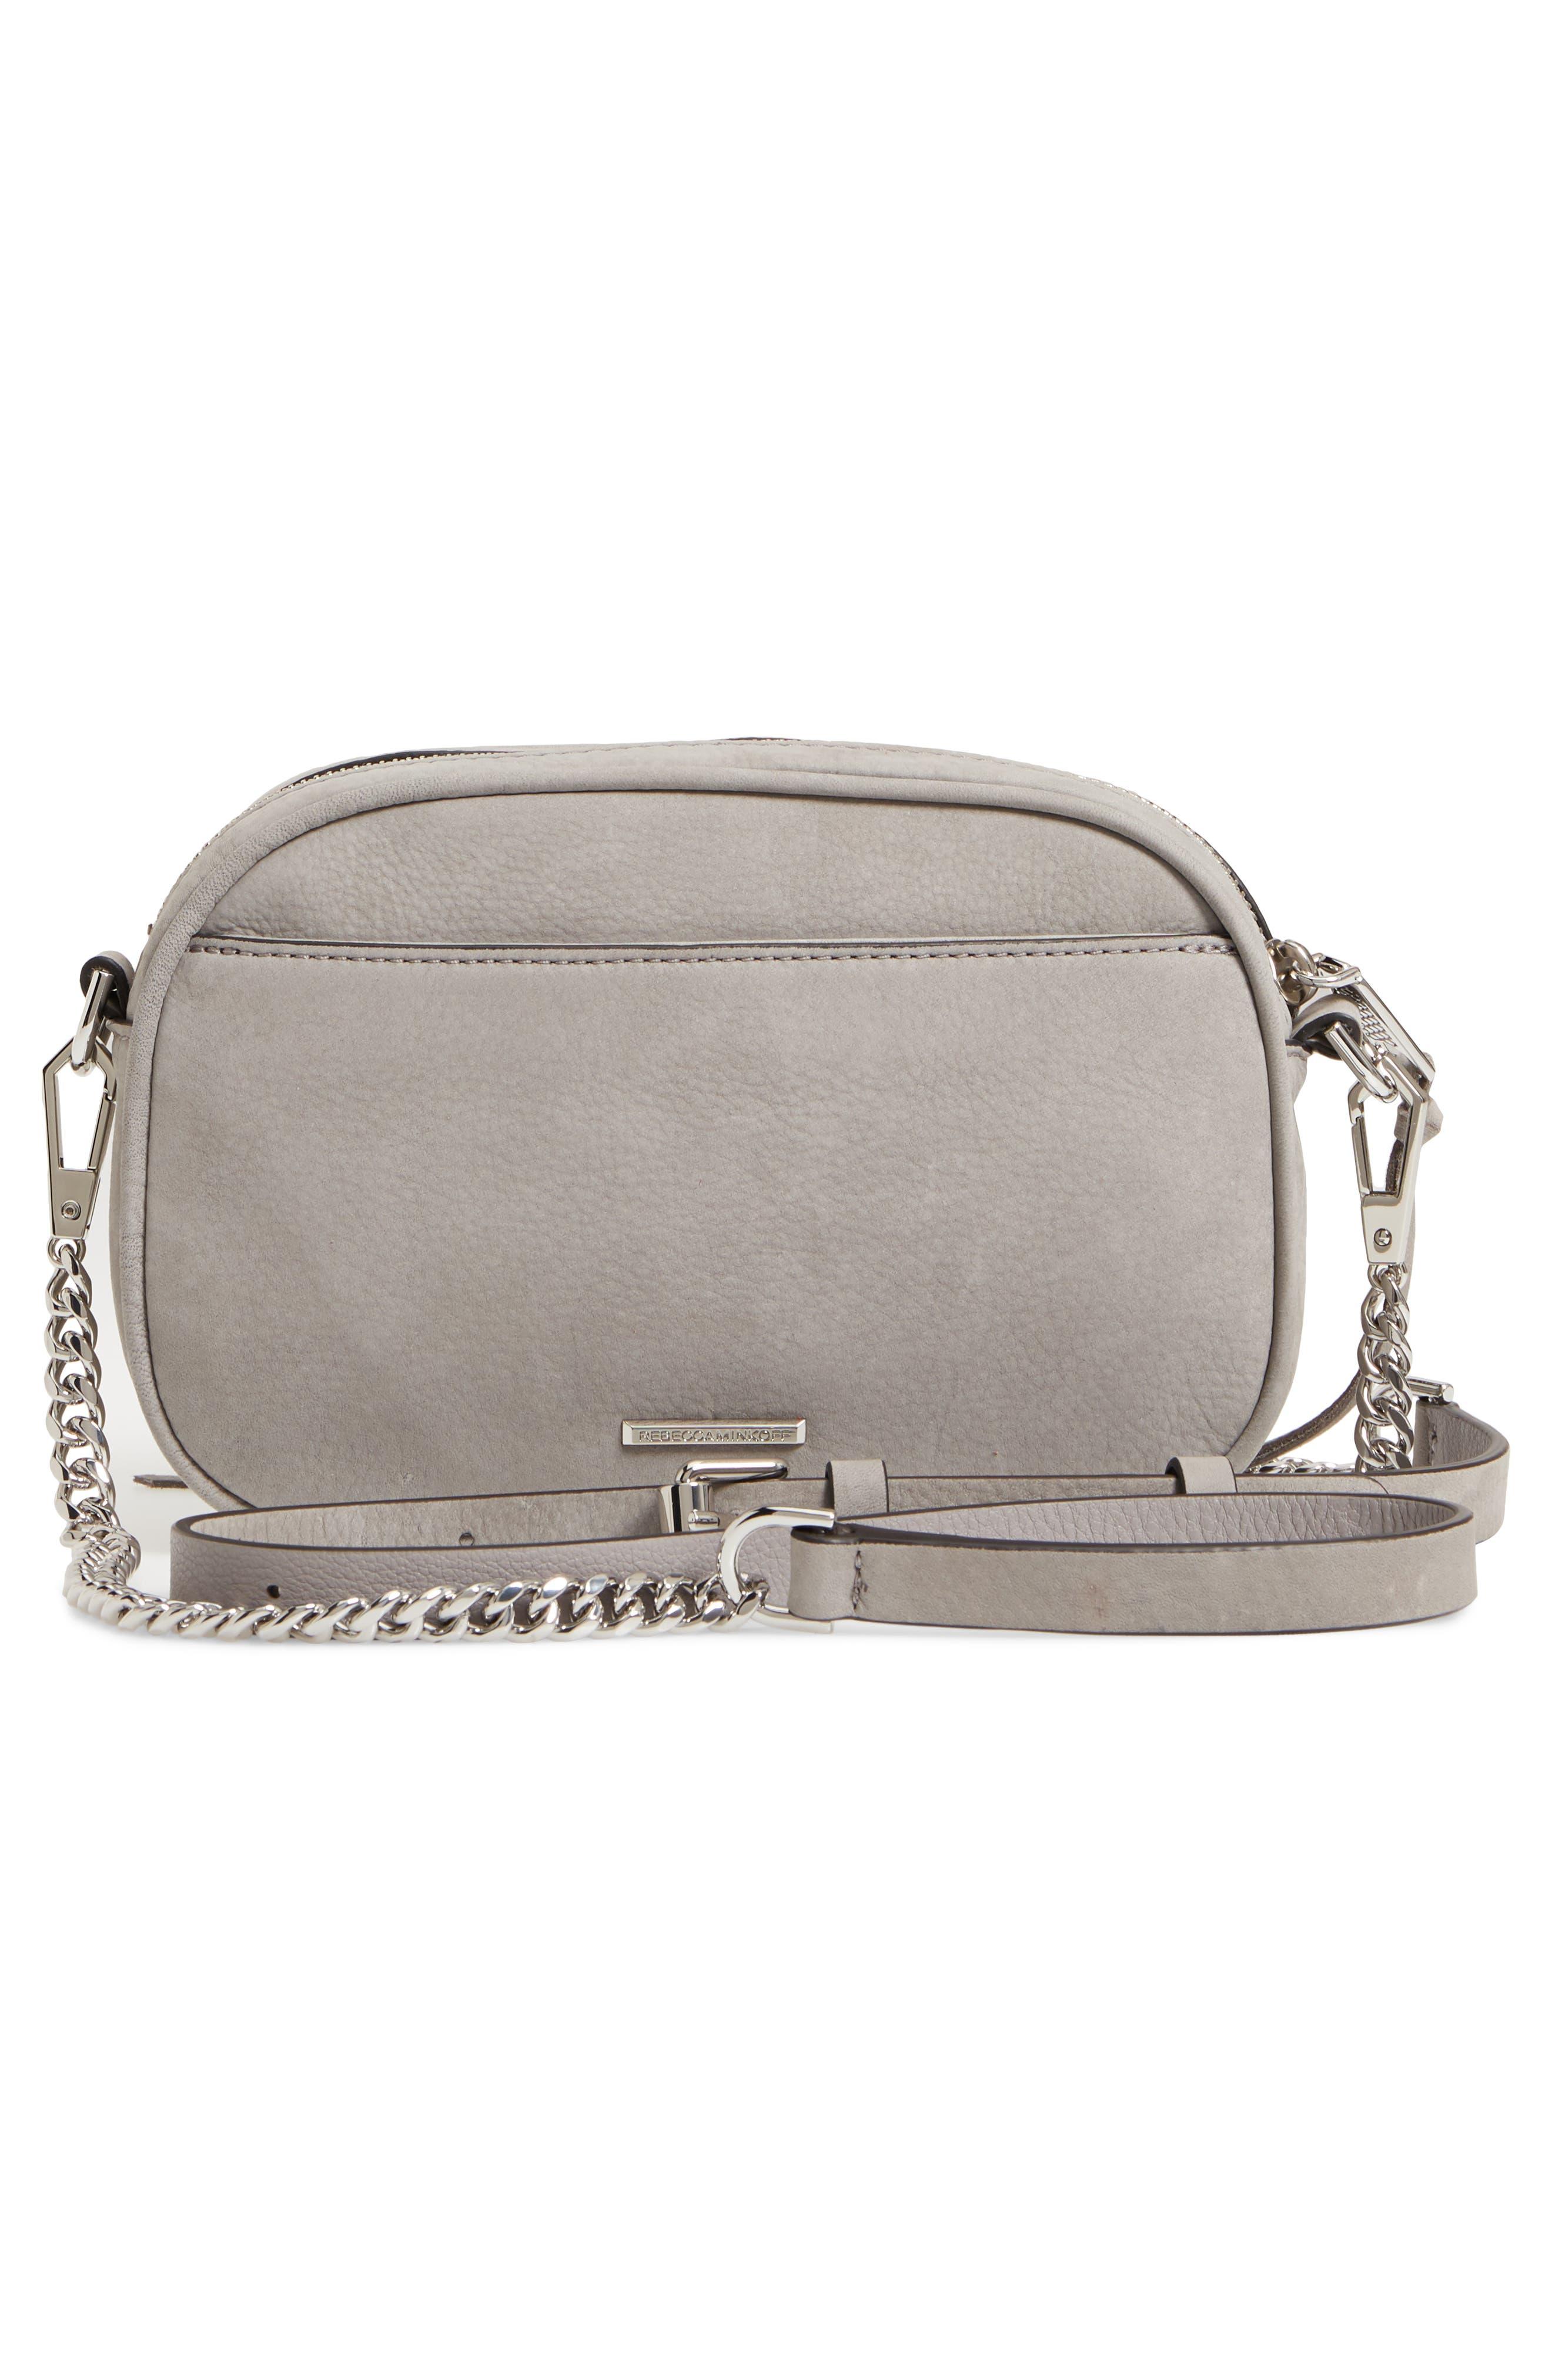 REBECCA MINKOFF,                             Blythe Leather Crossbody Bag,                             Alternate thumbnail 3, color,                             020